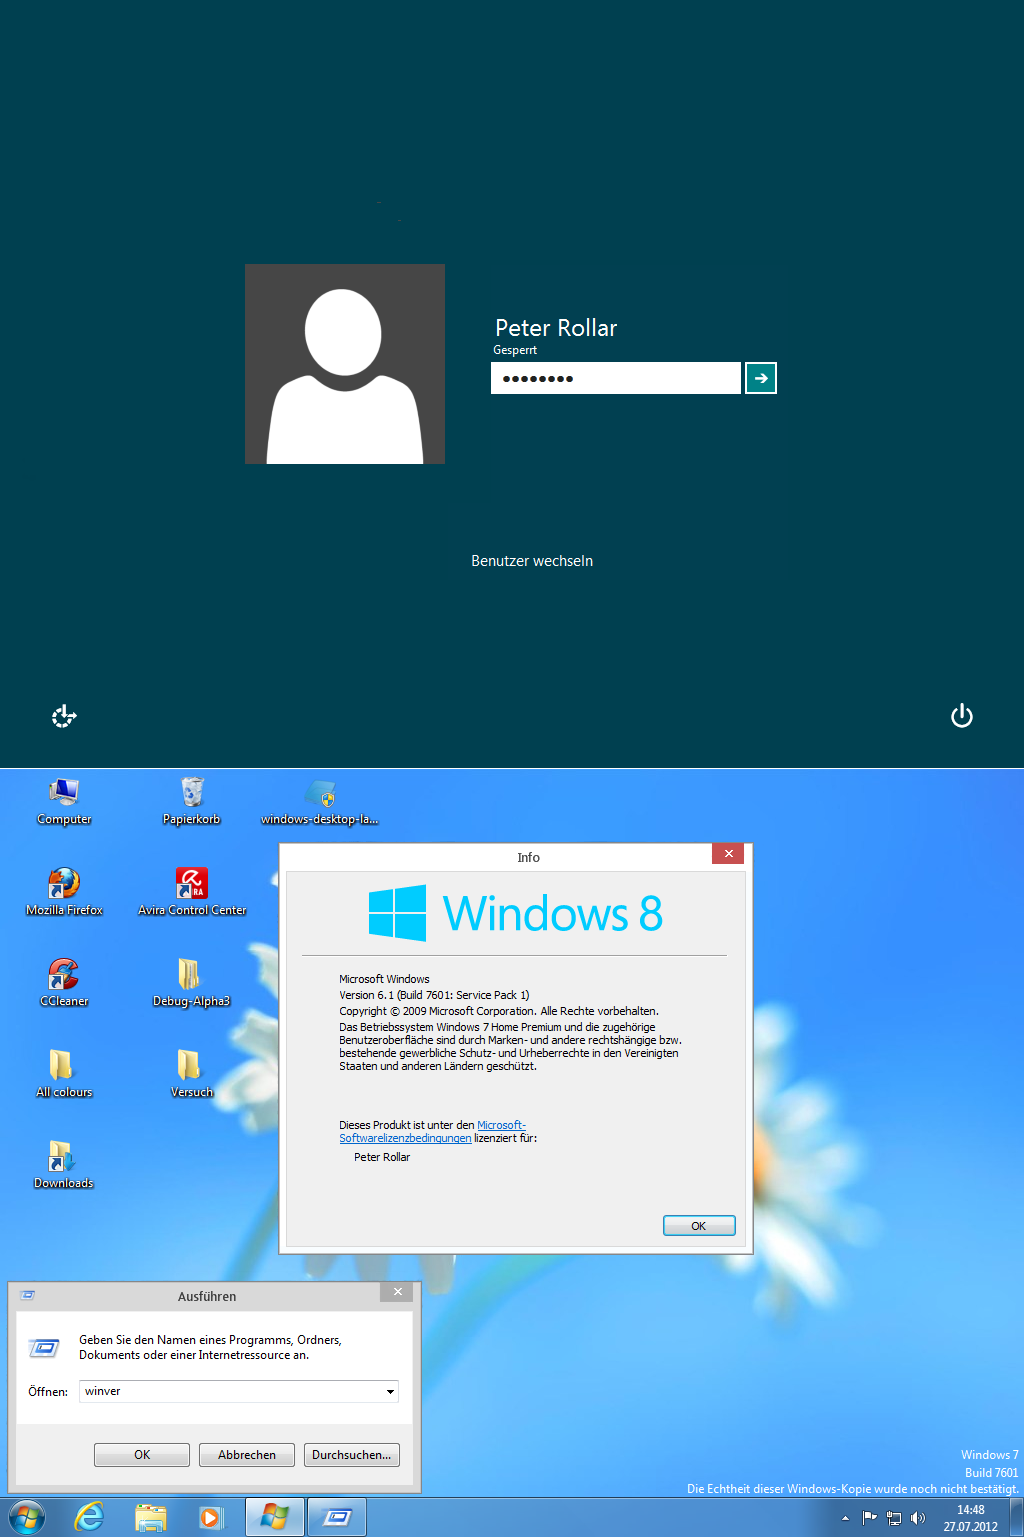 Windows8 RTM logon for Windows7